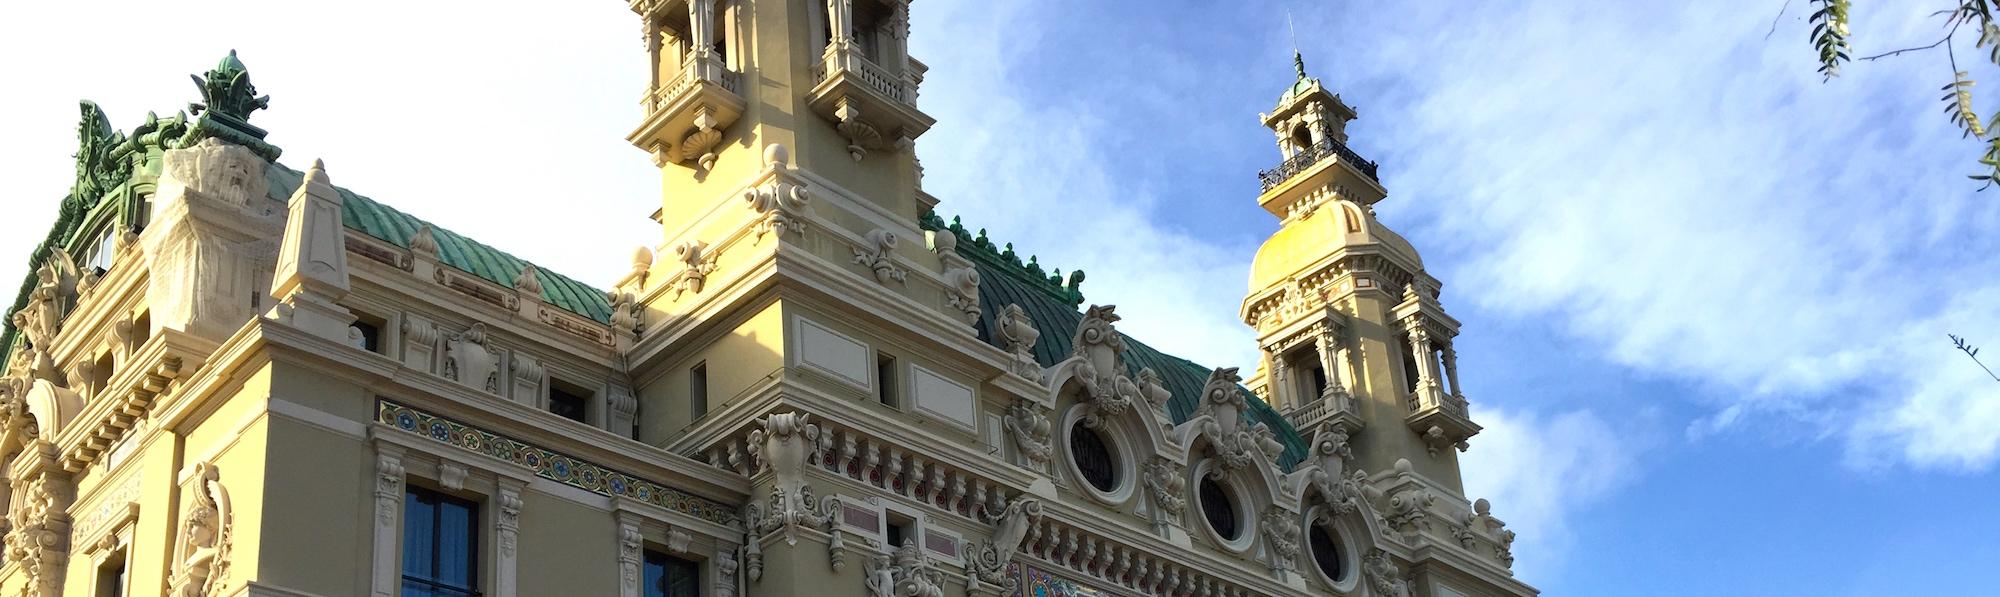 Casino Abajo de Montecarlo, Monaco